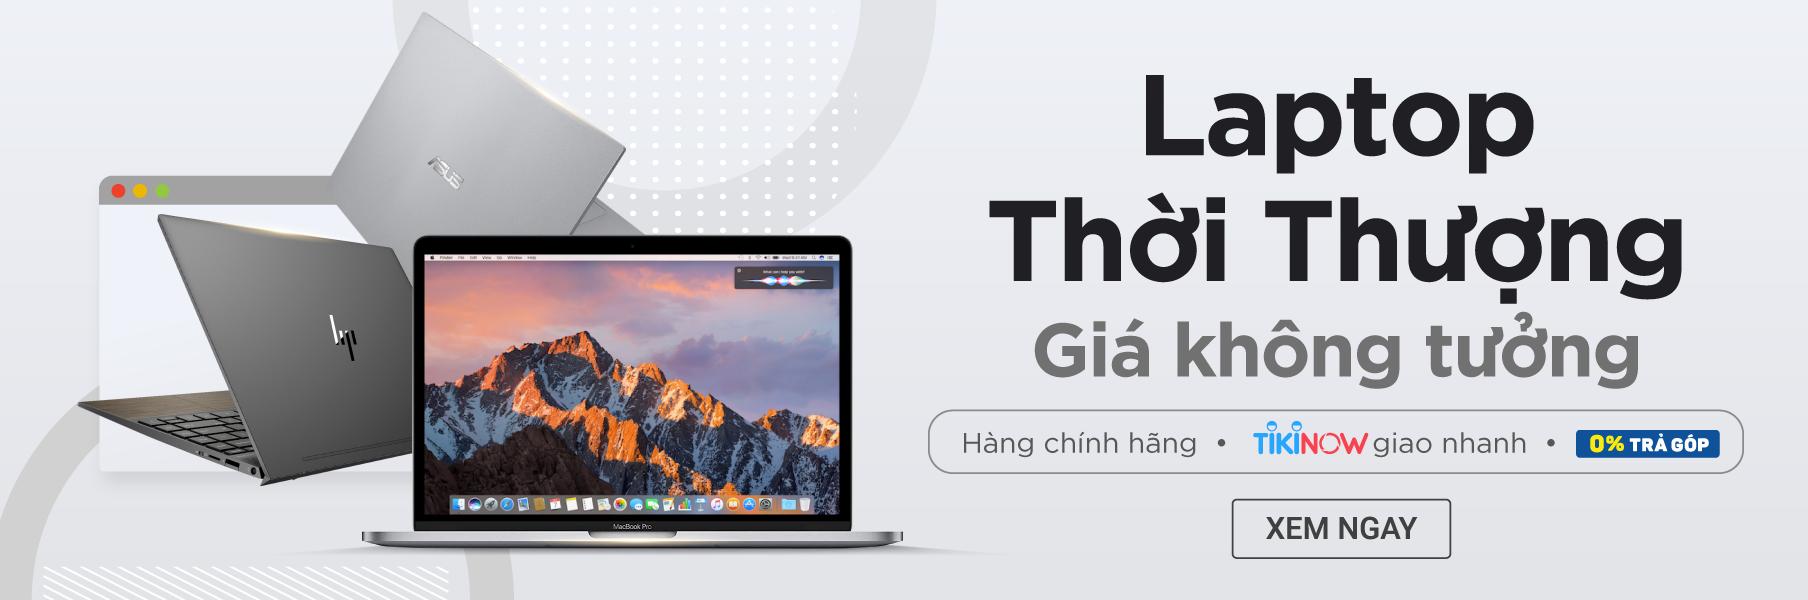 Acer - Laptop Truyền Thống giá rẻ